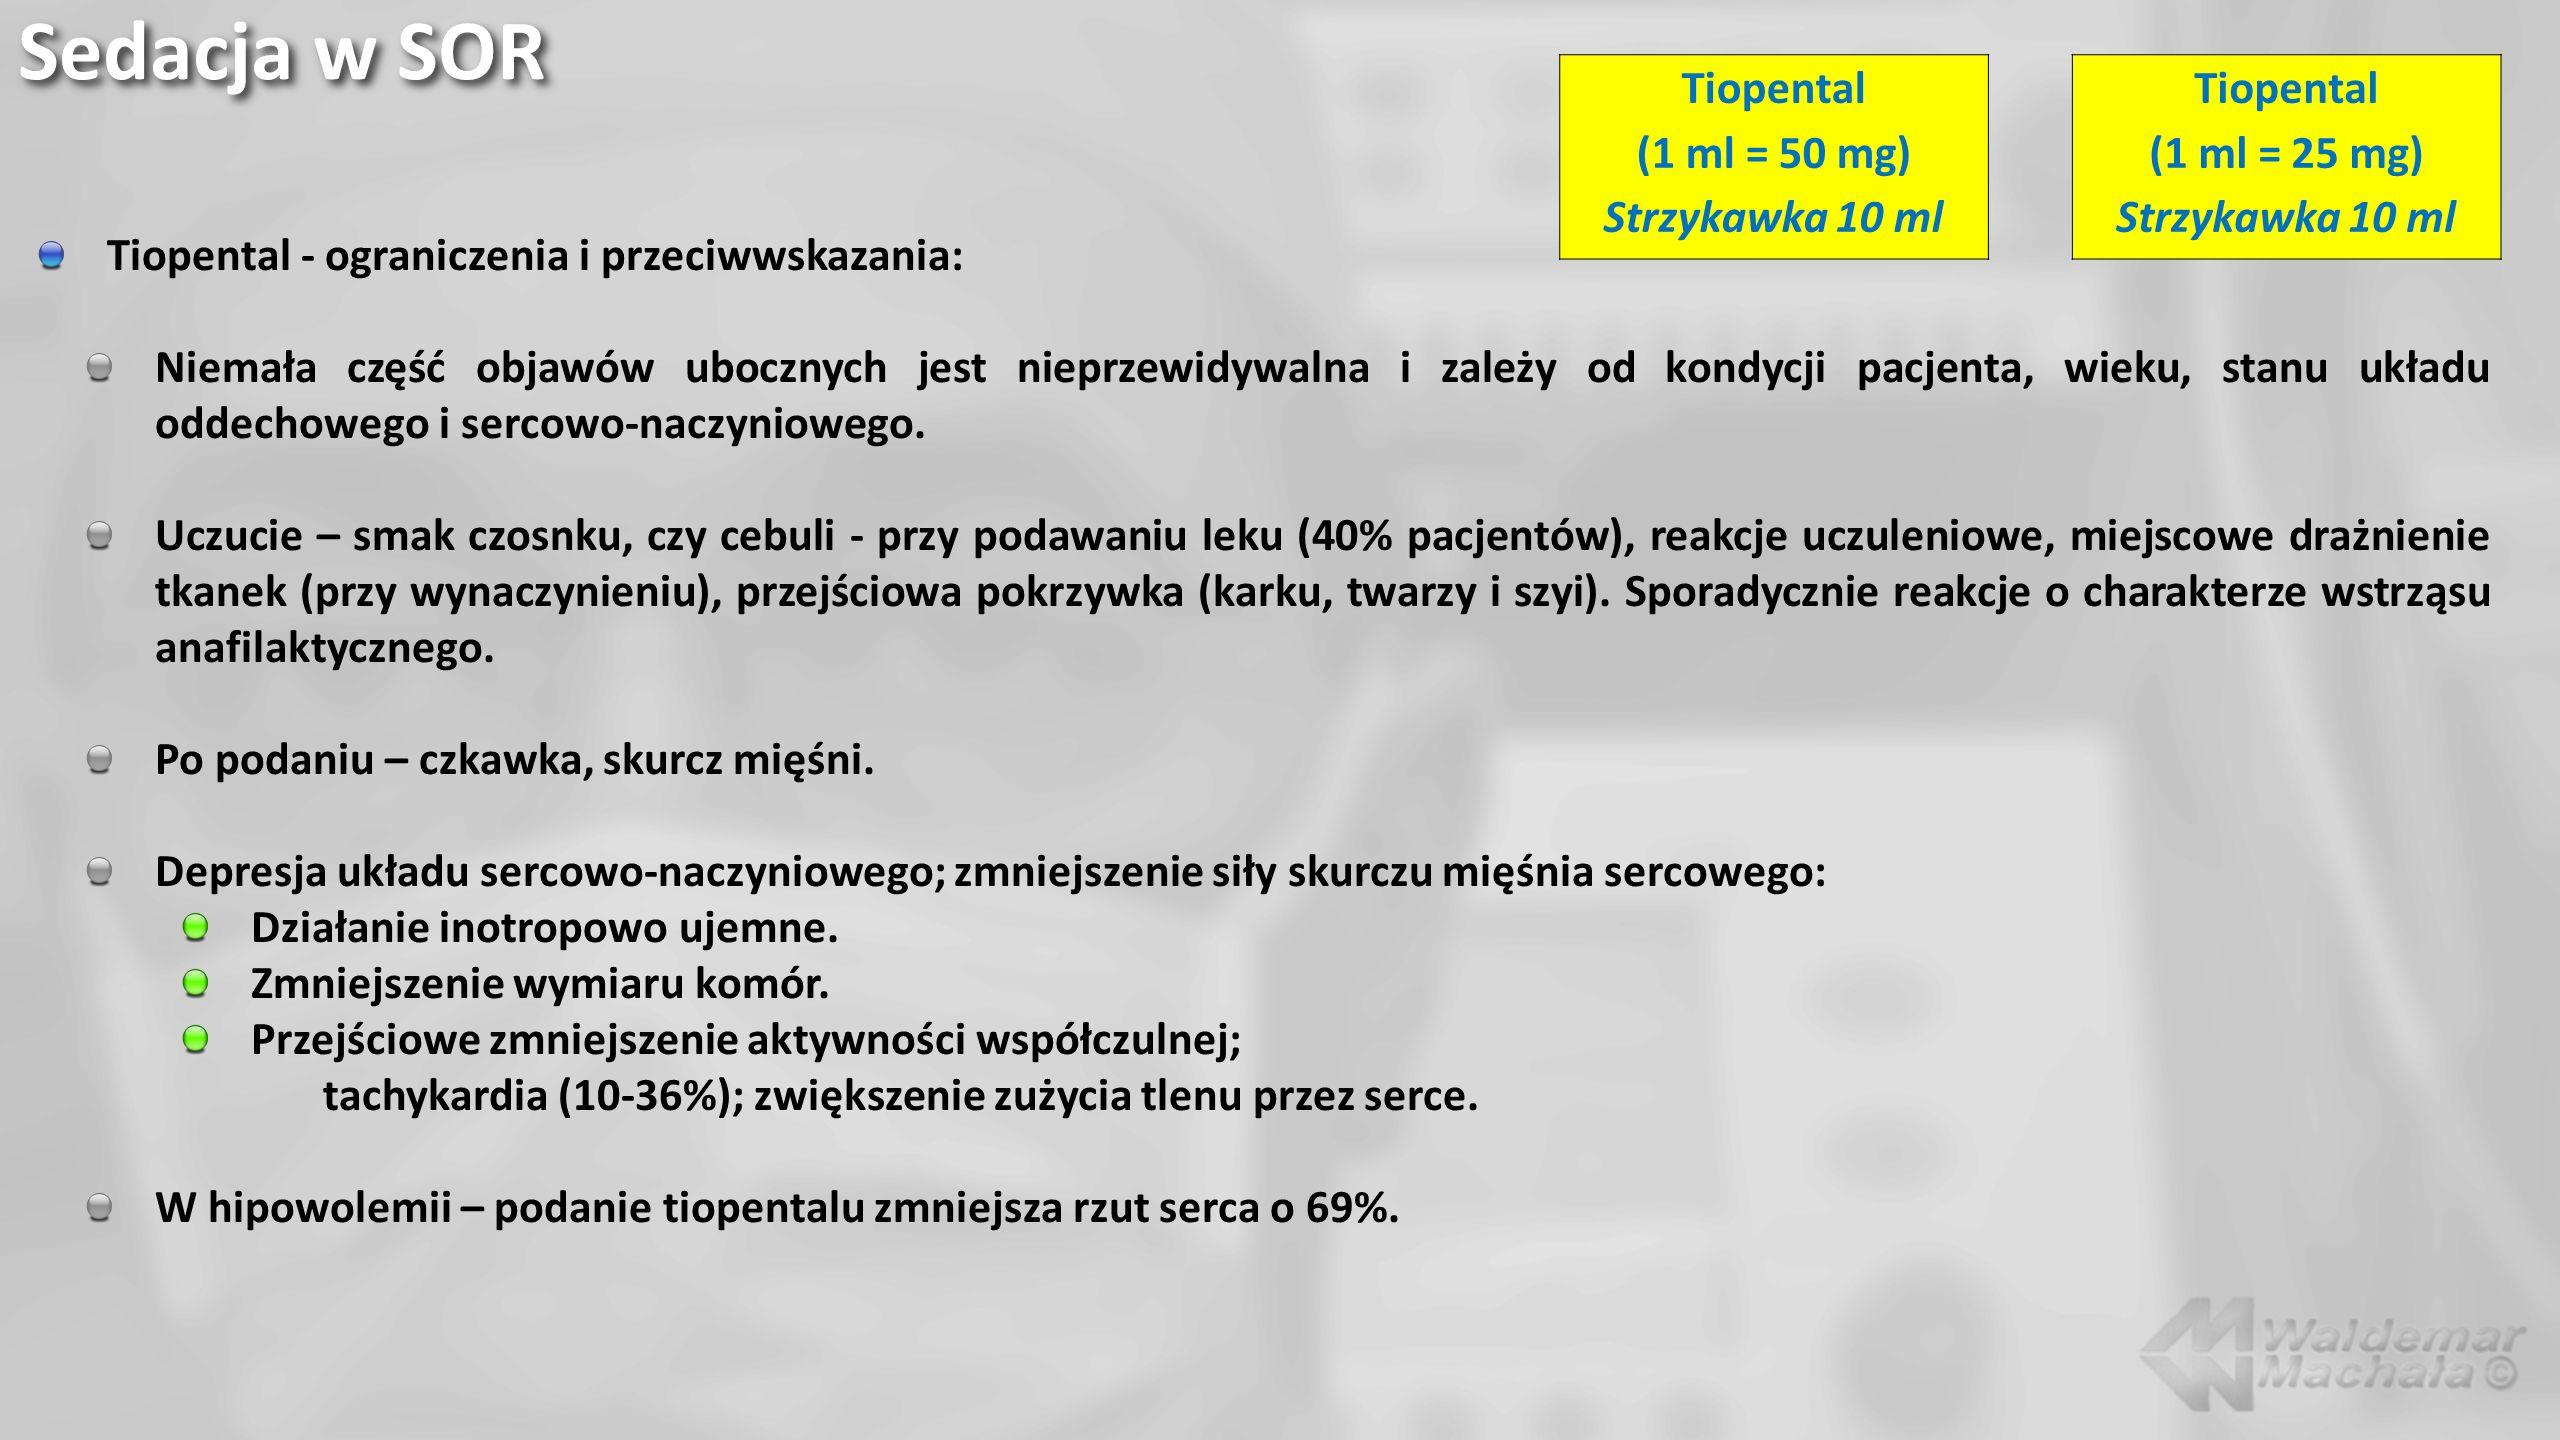 Sedacja w SOR Tiopental (1 ml = 50 mg) Strzykawka 10 ml Tiopental